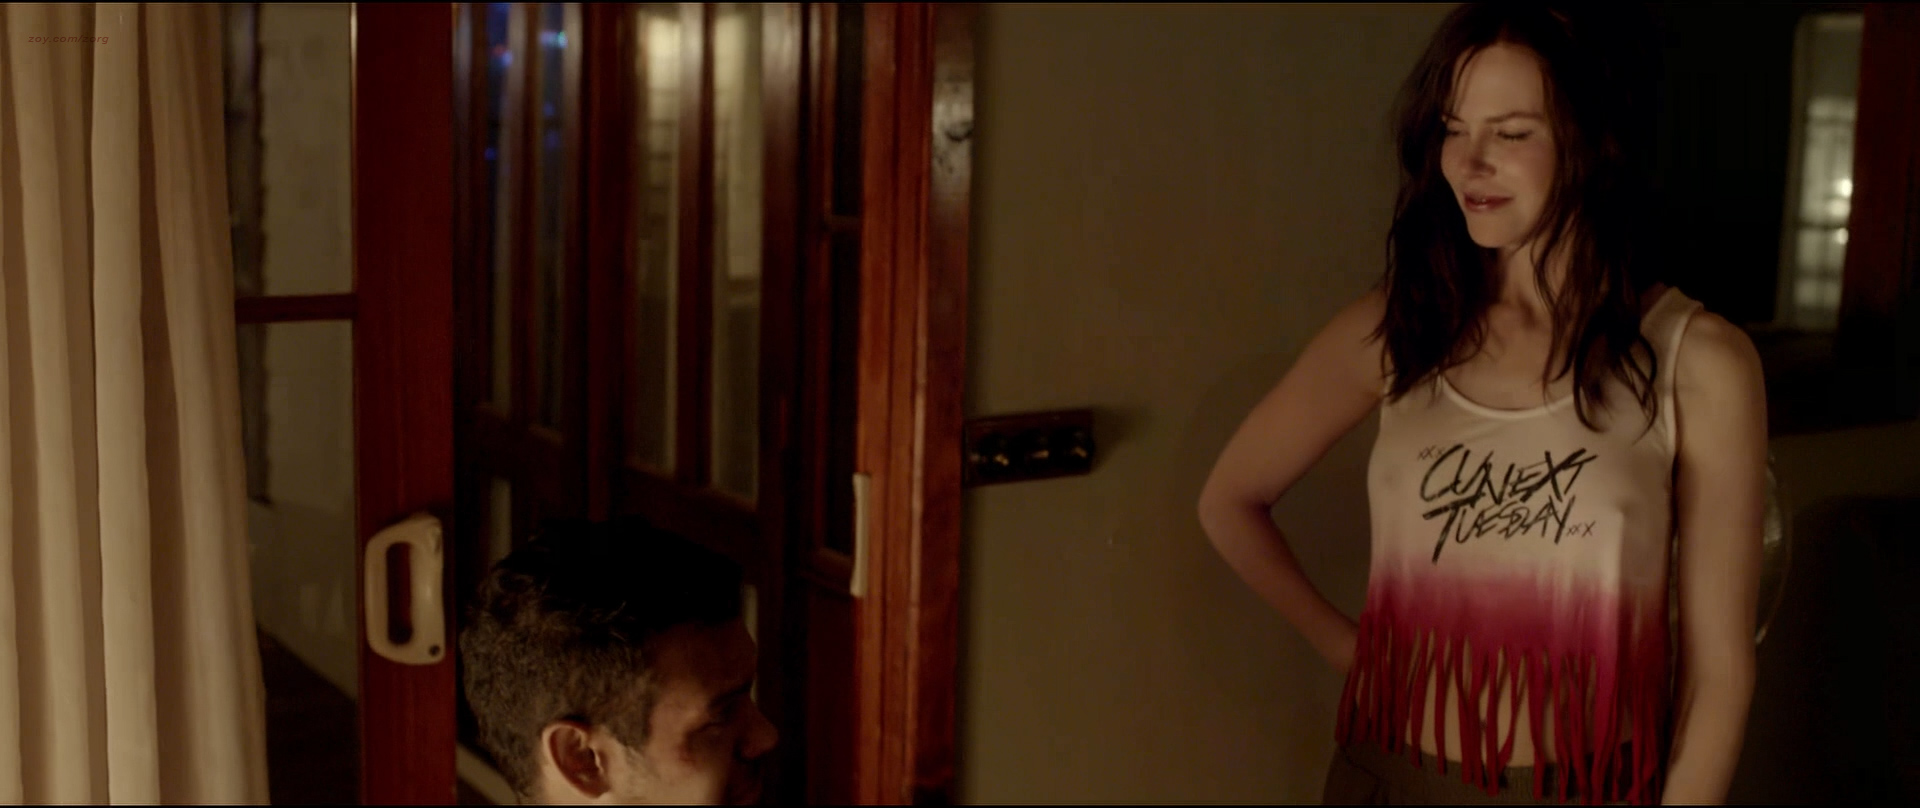 Nicole Kidman nude full frontal or bd and Madisson Brown hot - Strangerland (2015) hd1080p BluRay (4)